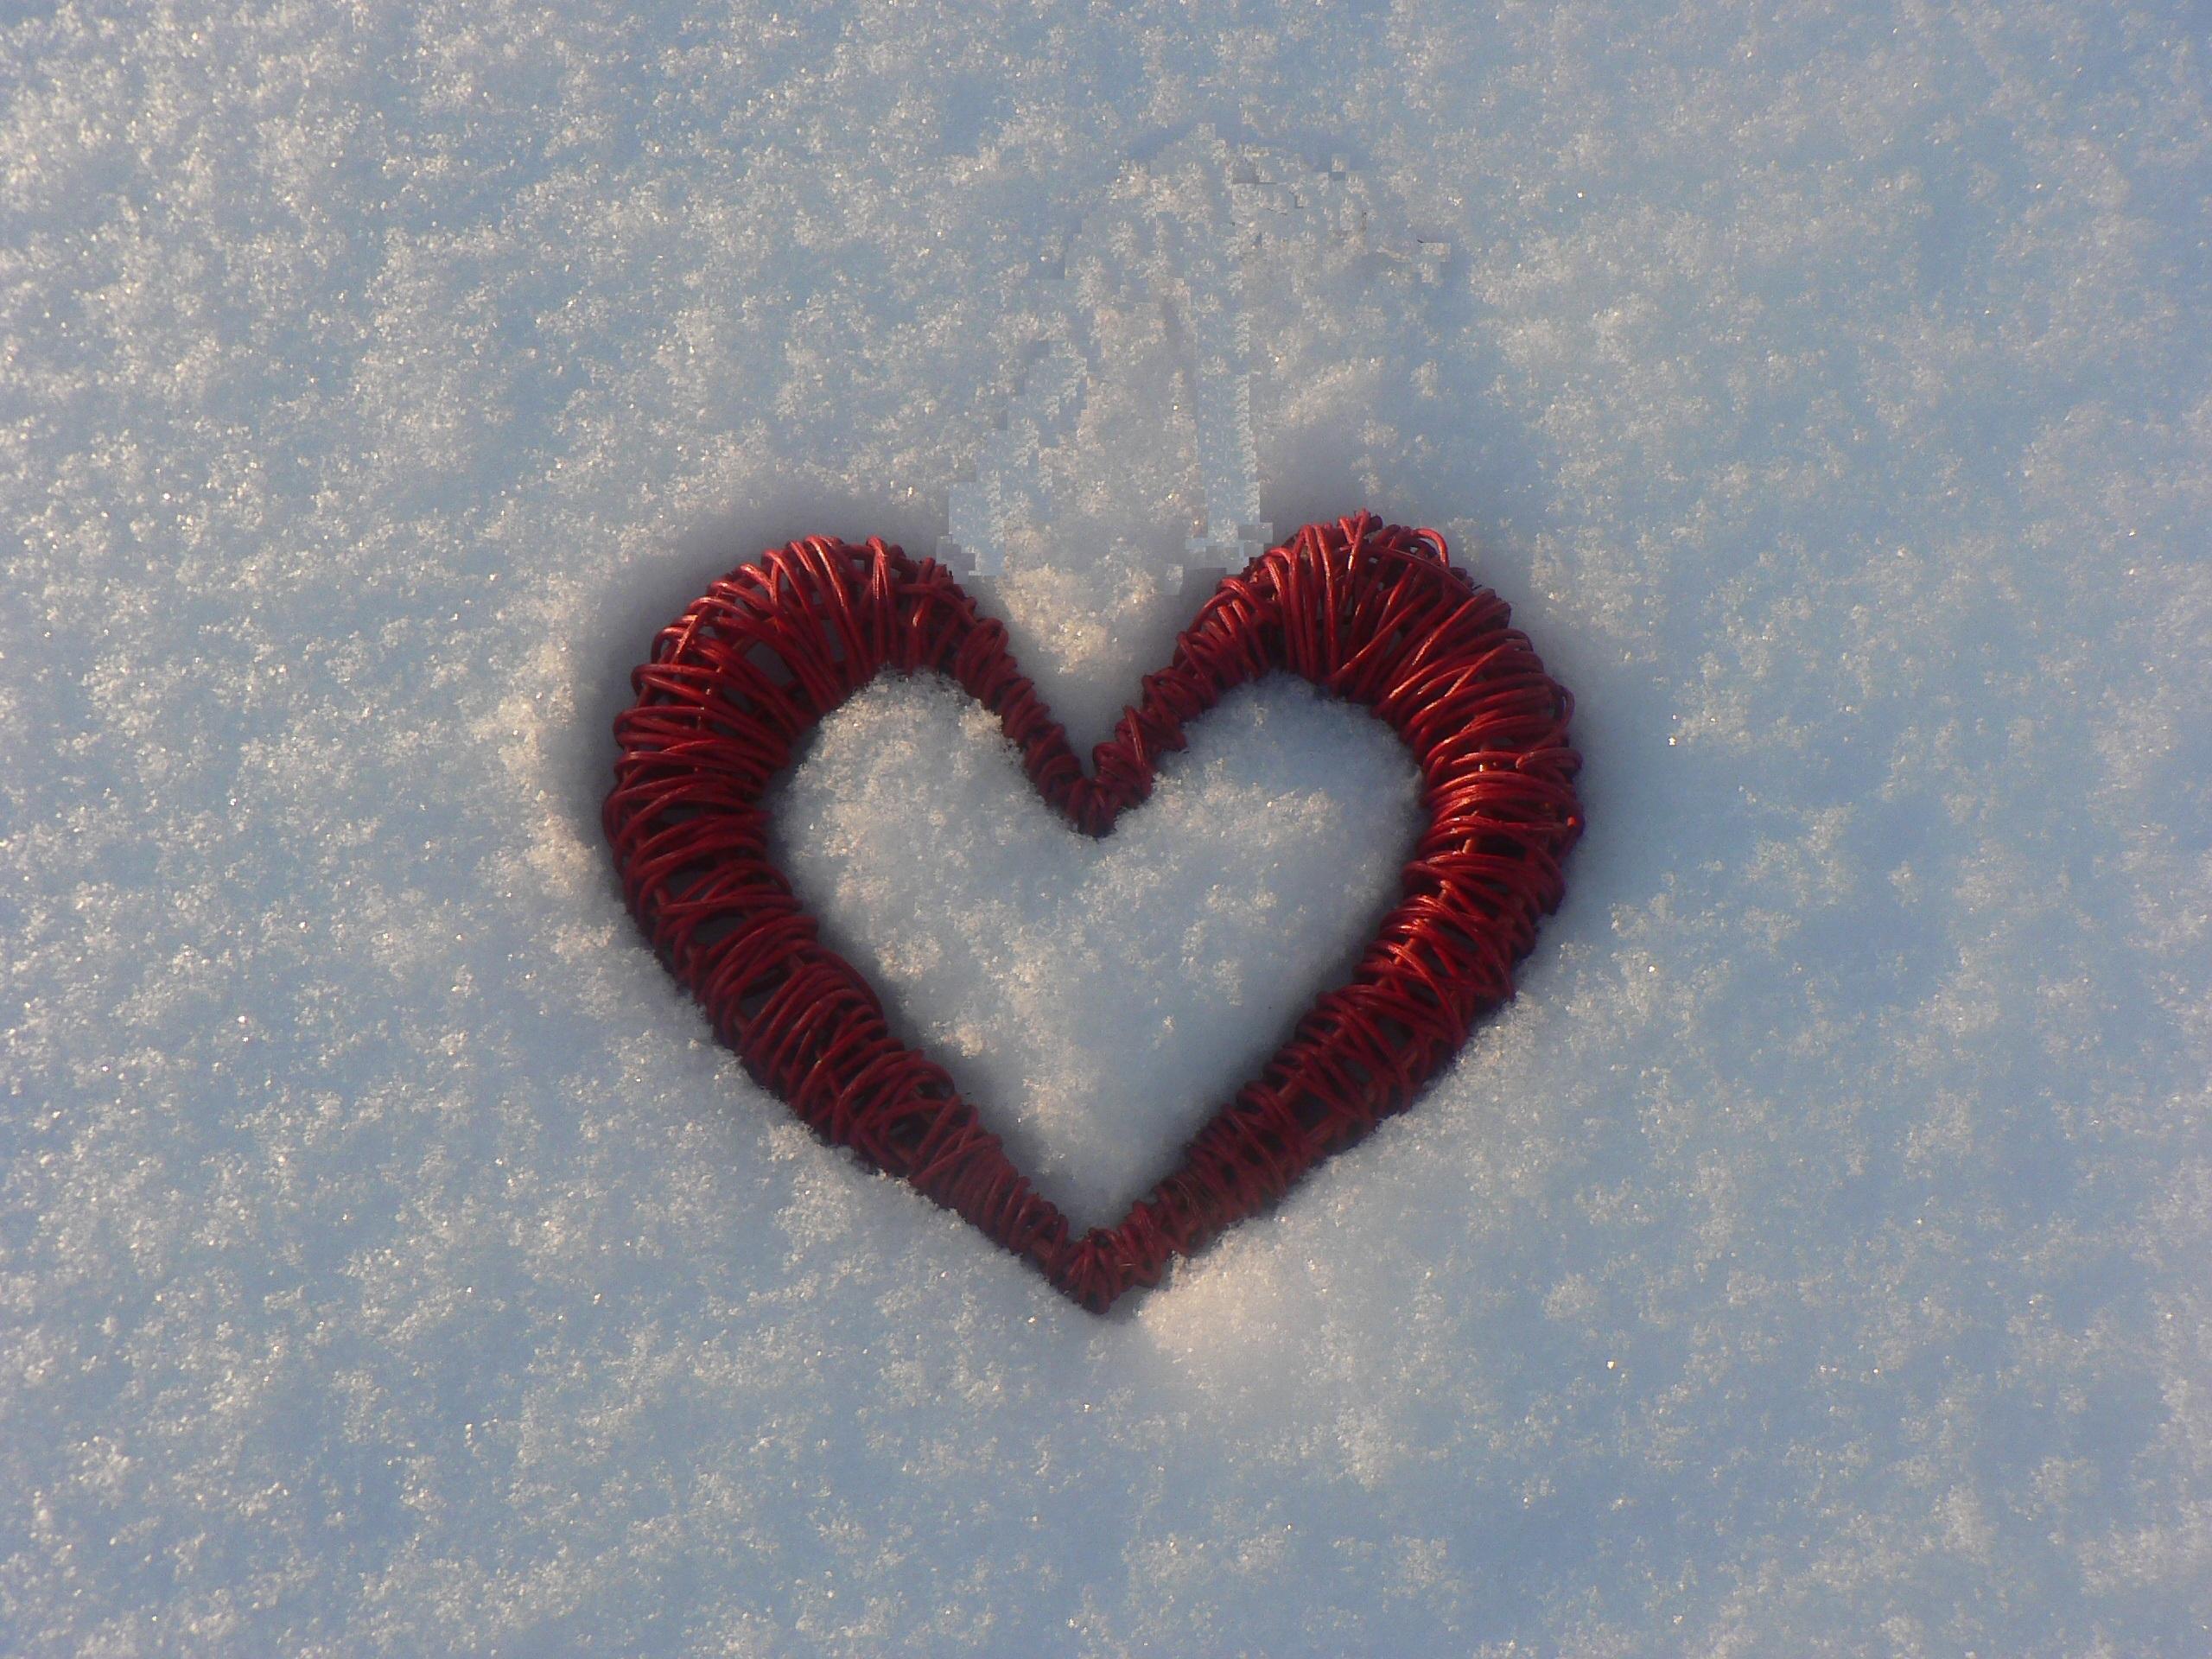 картинки сердце на снегу печать фото